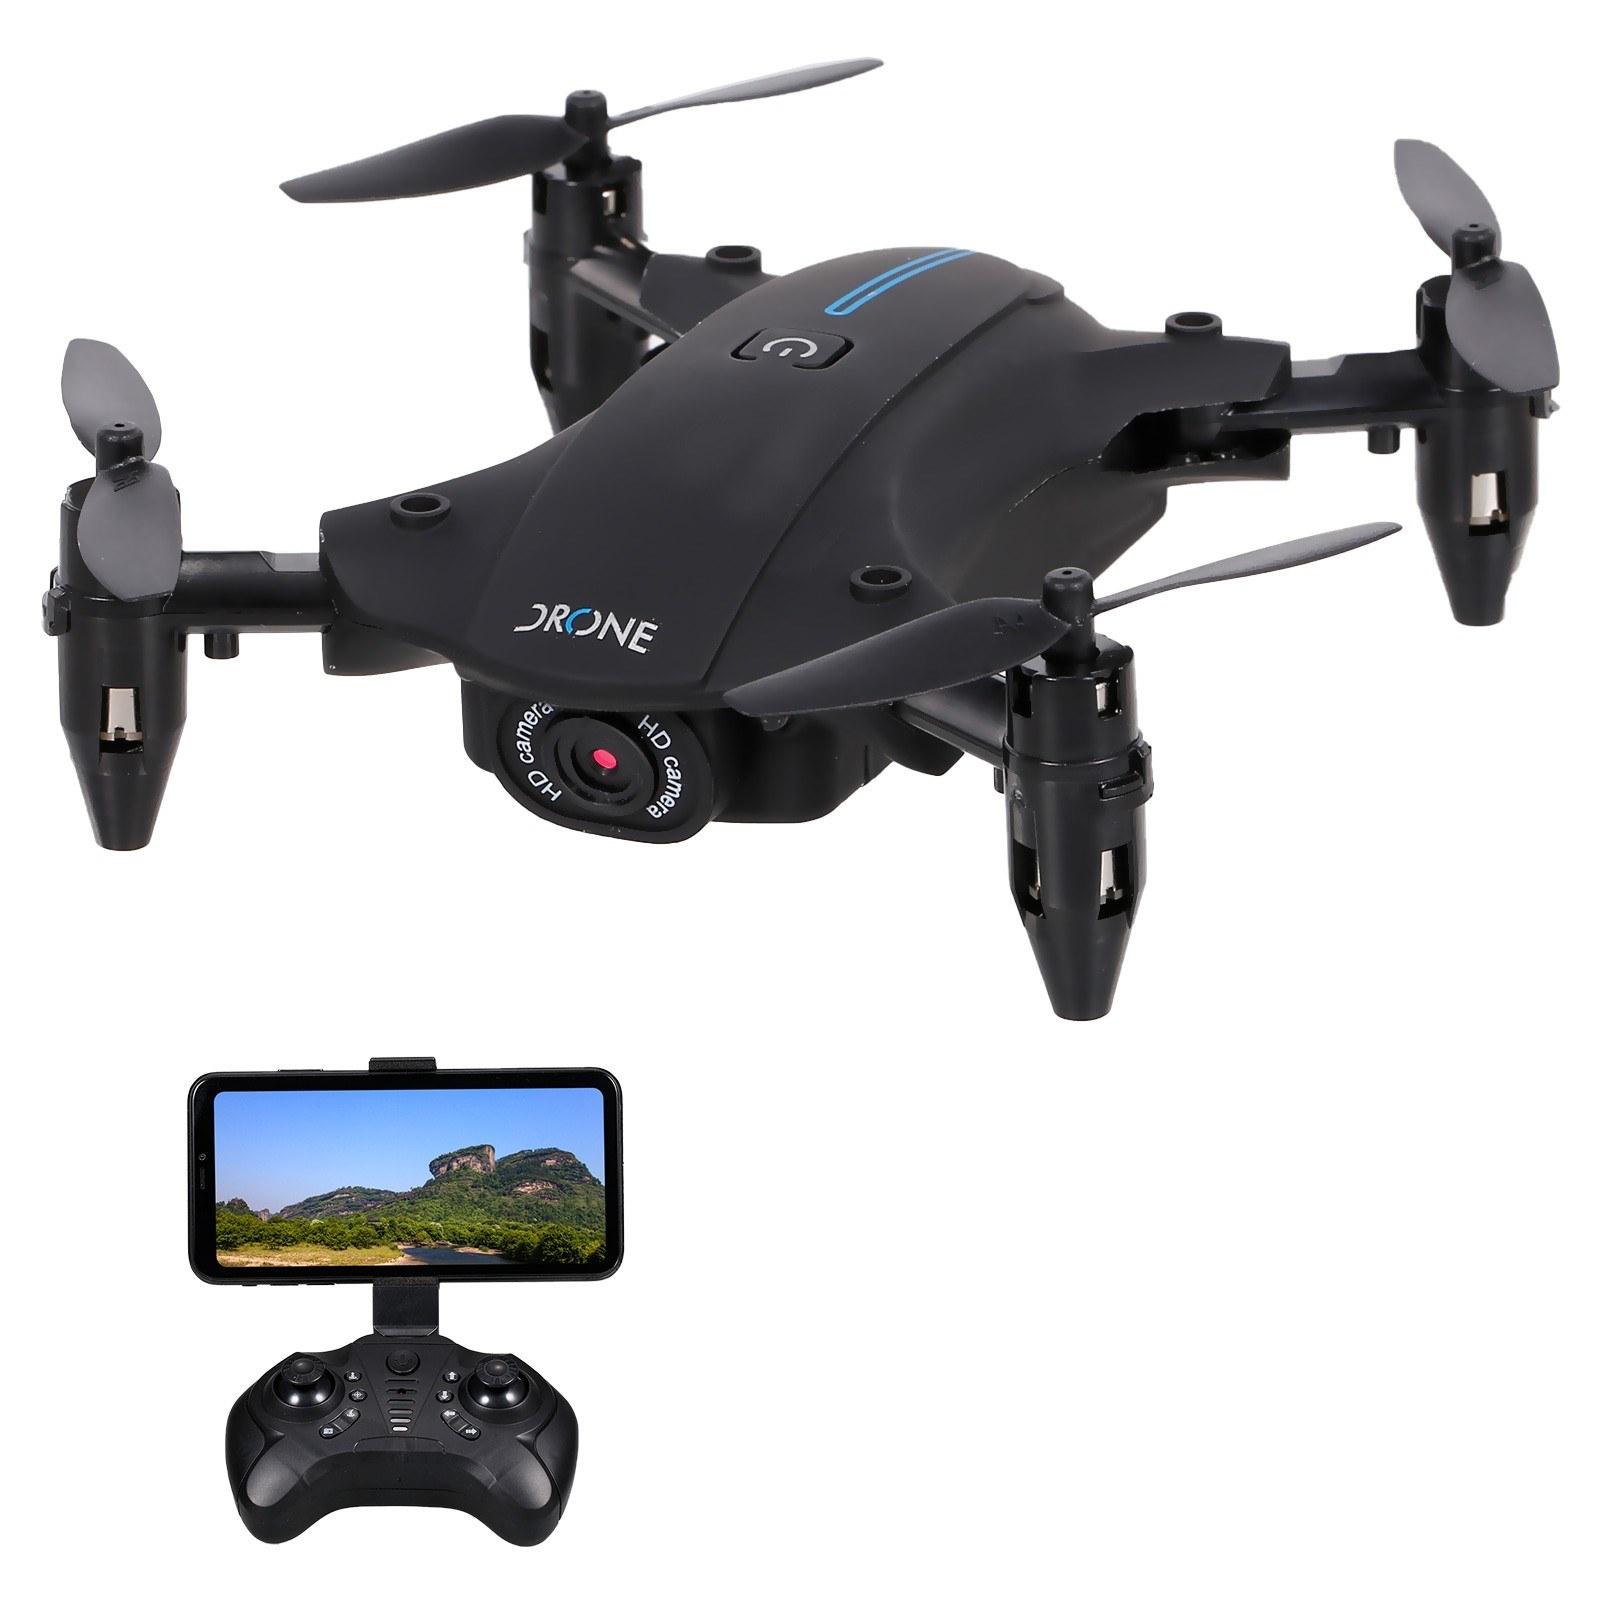 cafago.com - 52% OFF H2 Wifi FPV 4K Camera RC Drone Mini Folding Quadcopter,free shipping+$30.49